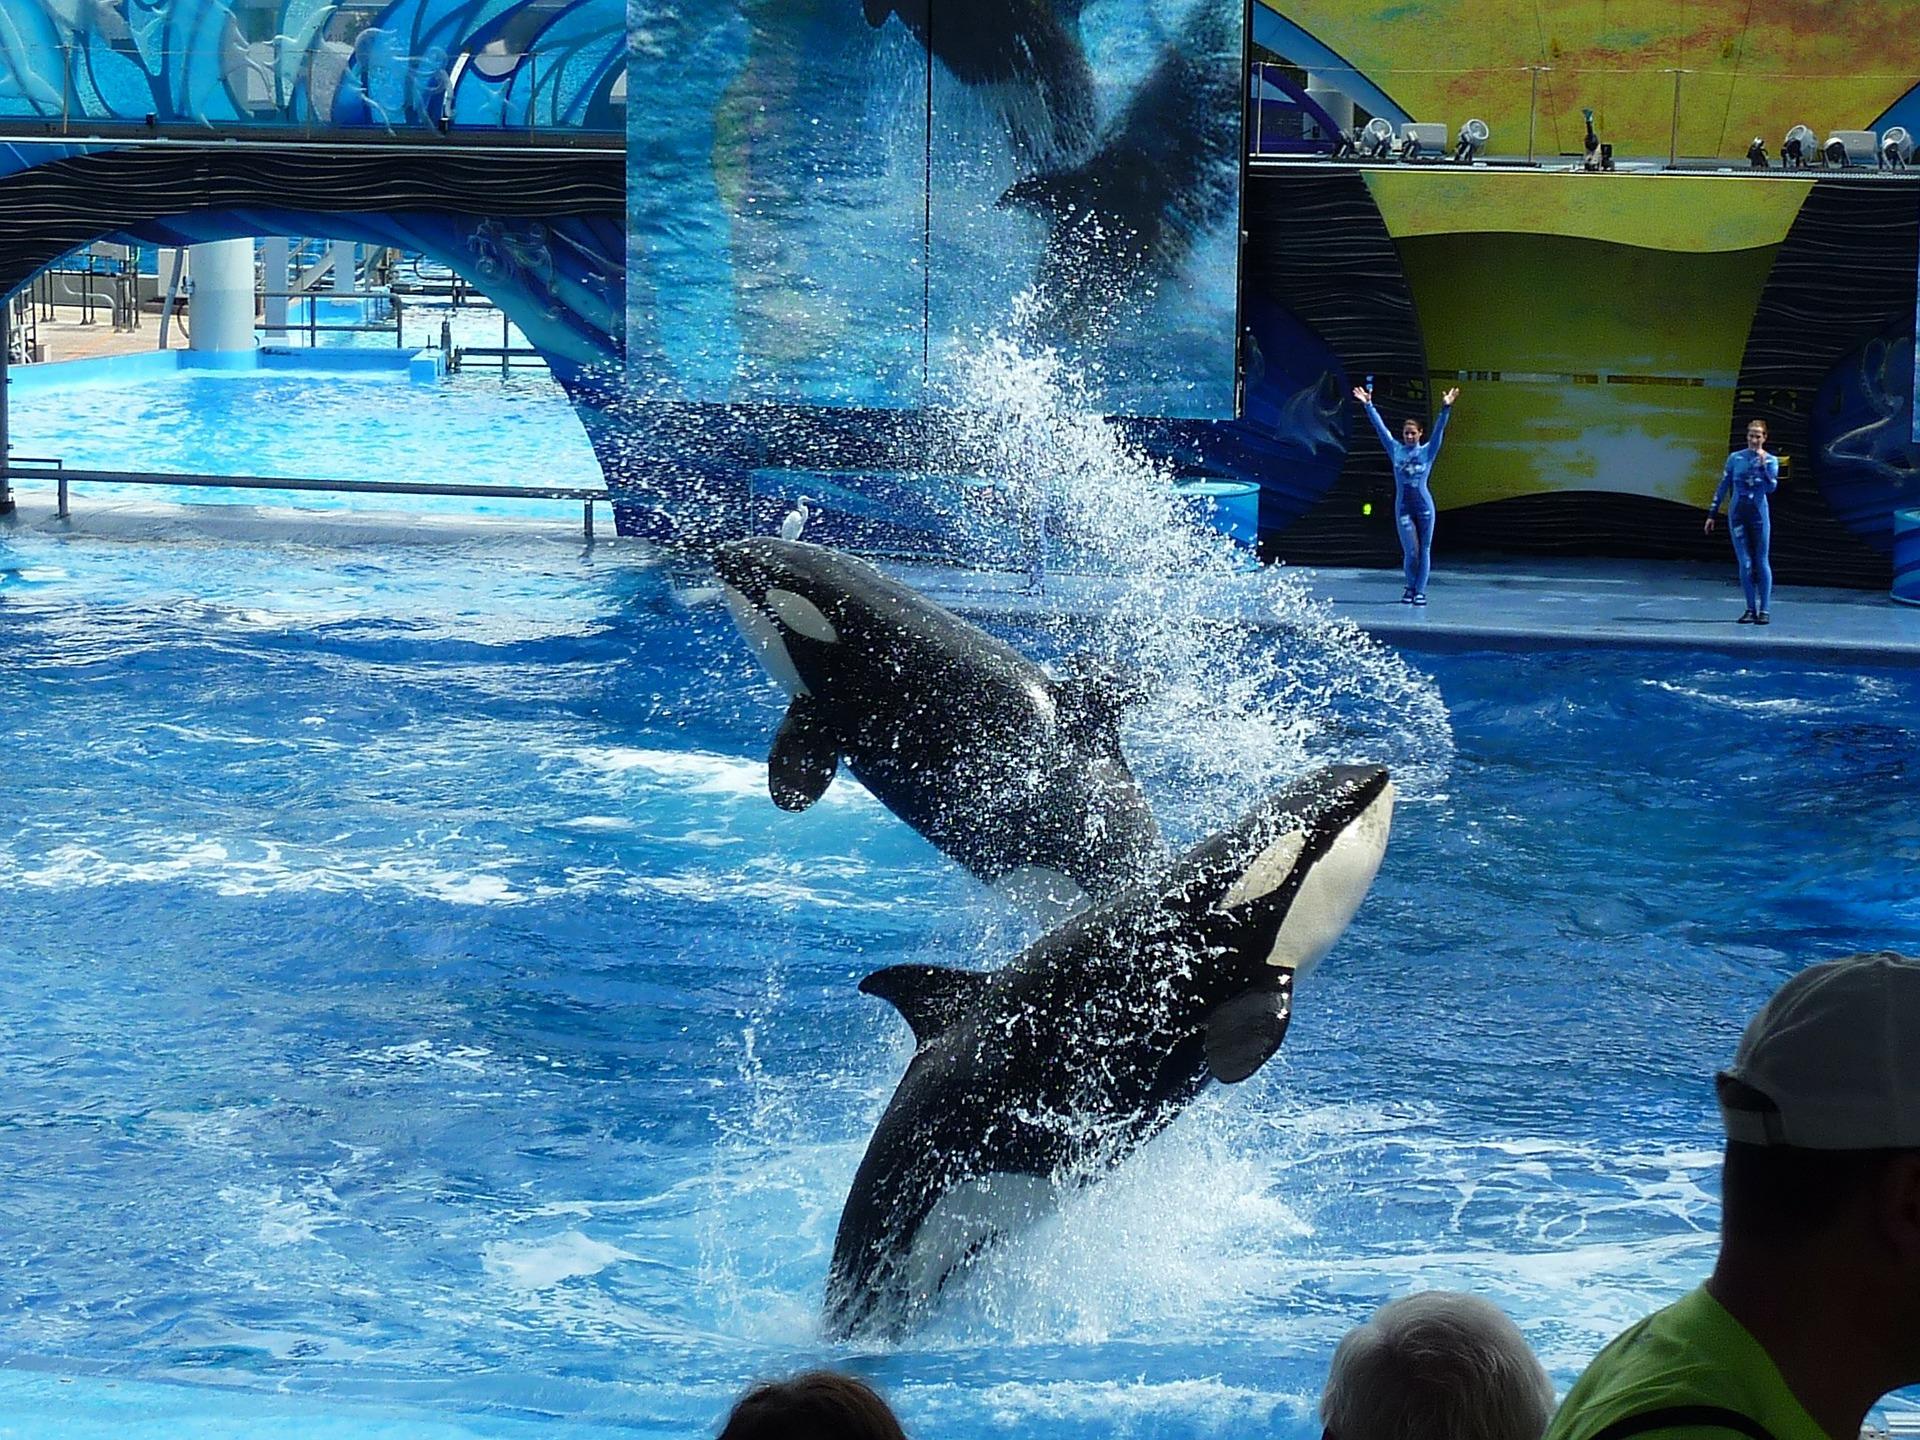 killer-whale-113527_1920